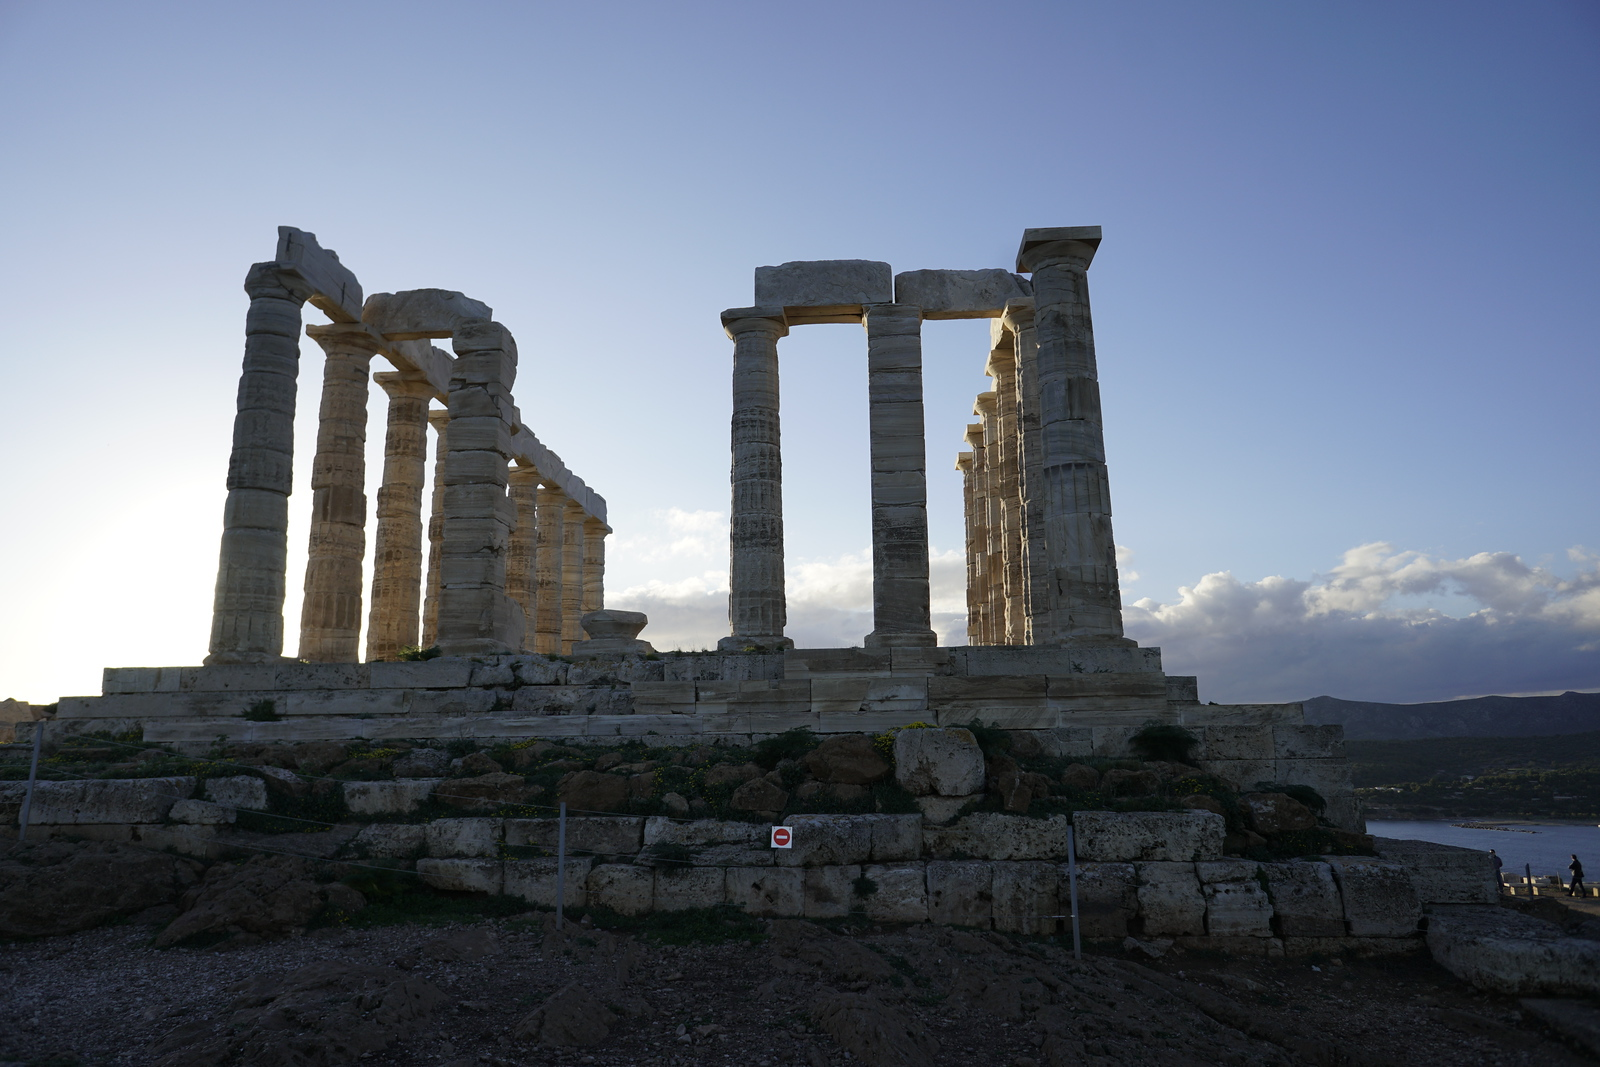 080 - Cape Sounion - Temple of Poseidon 1